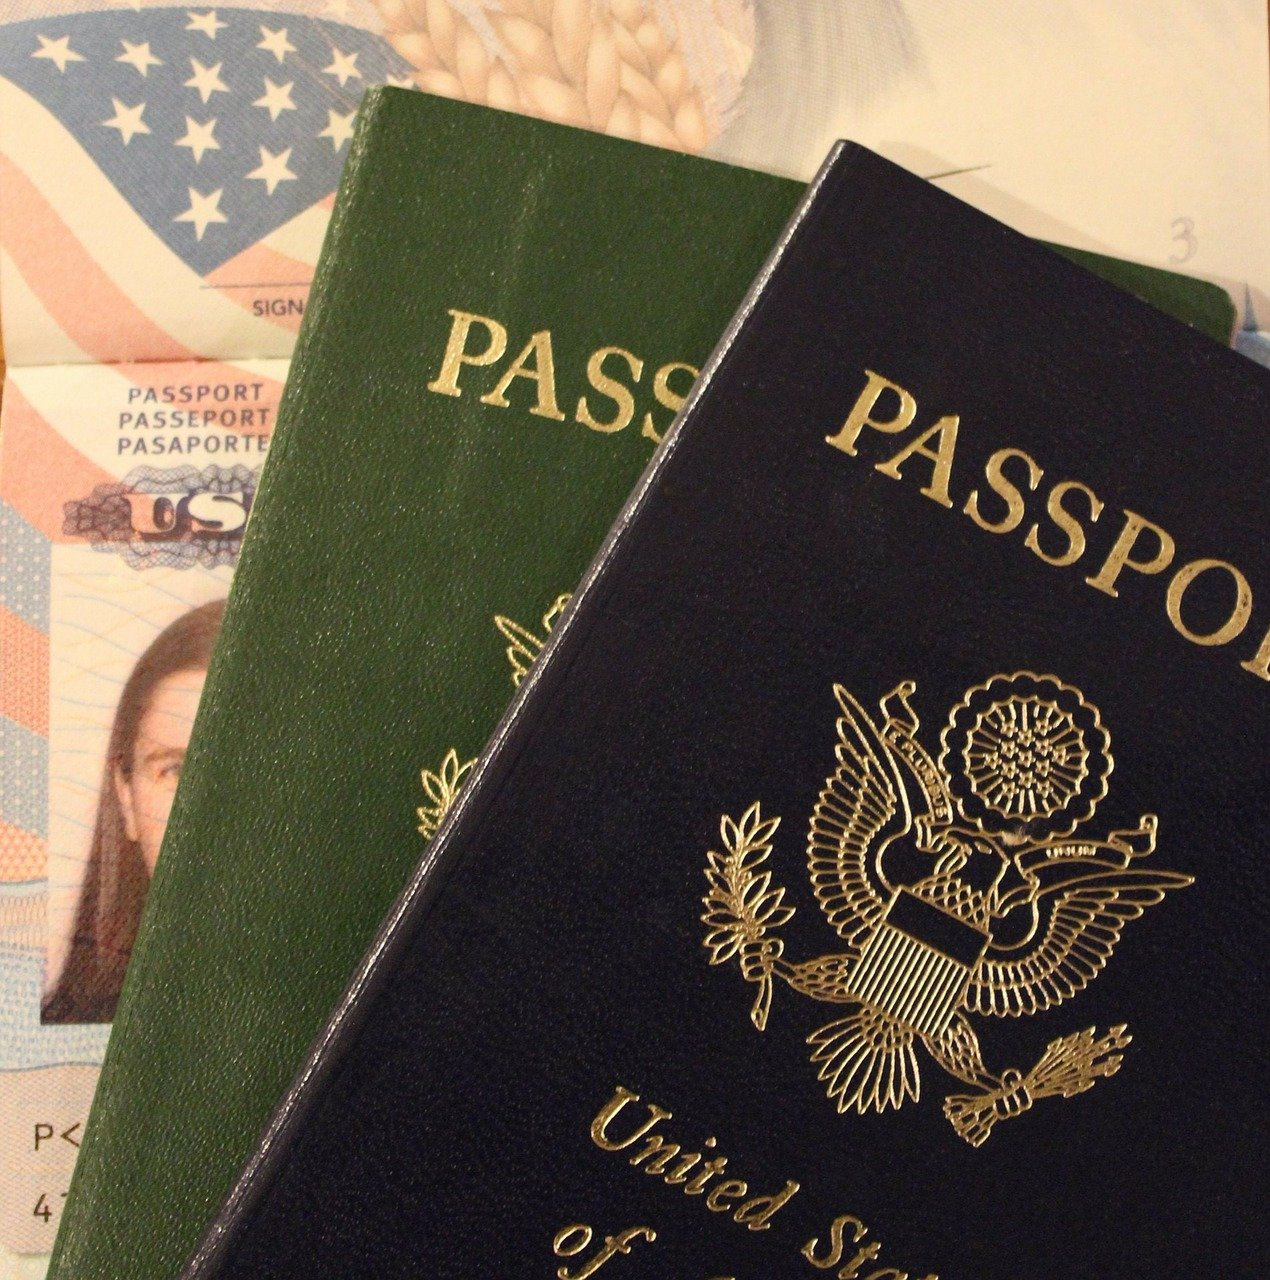 passport, united states, documentation